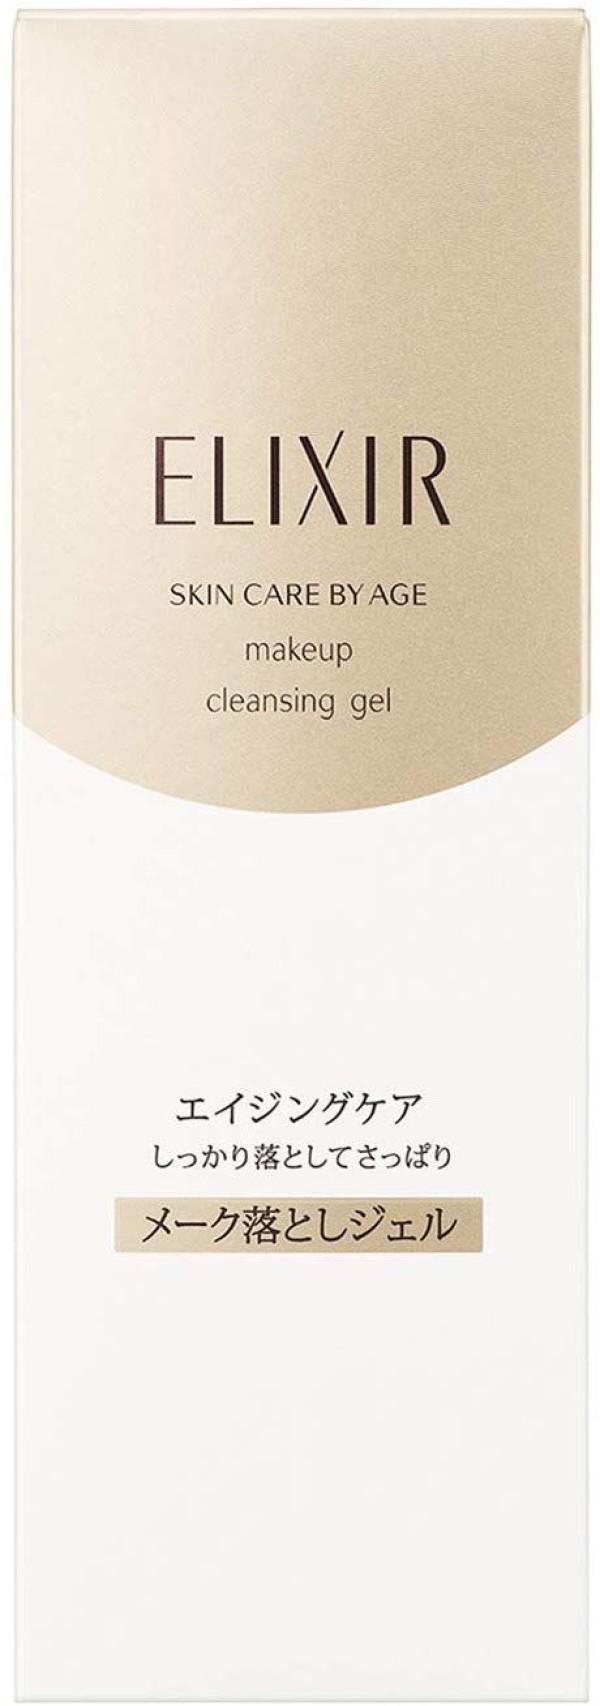 Shiseido ELIXIR SUPERIEUR Makeup Cleansing Gel